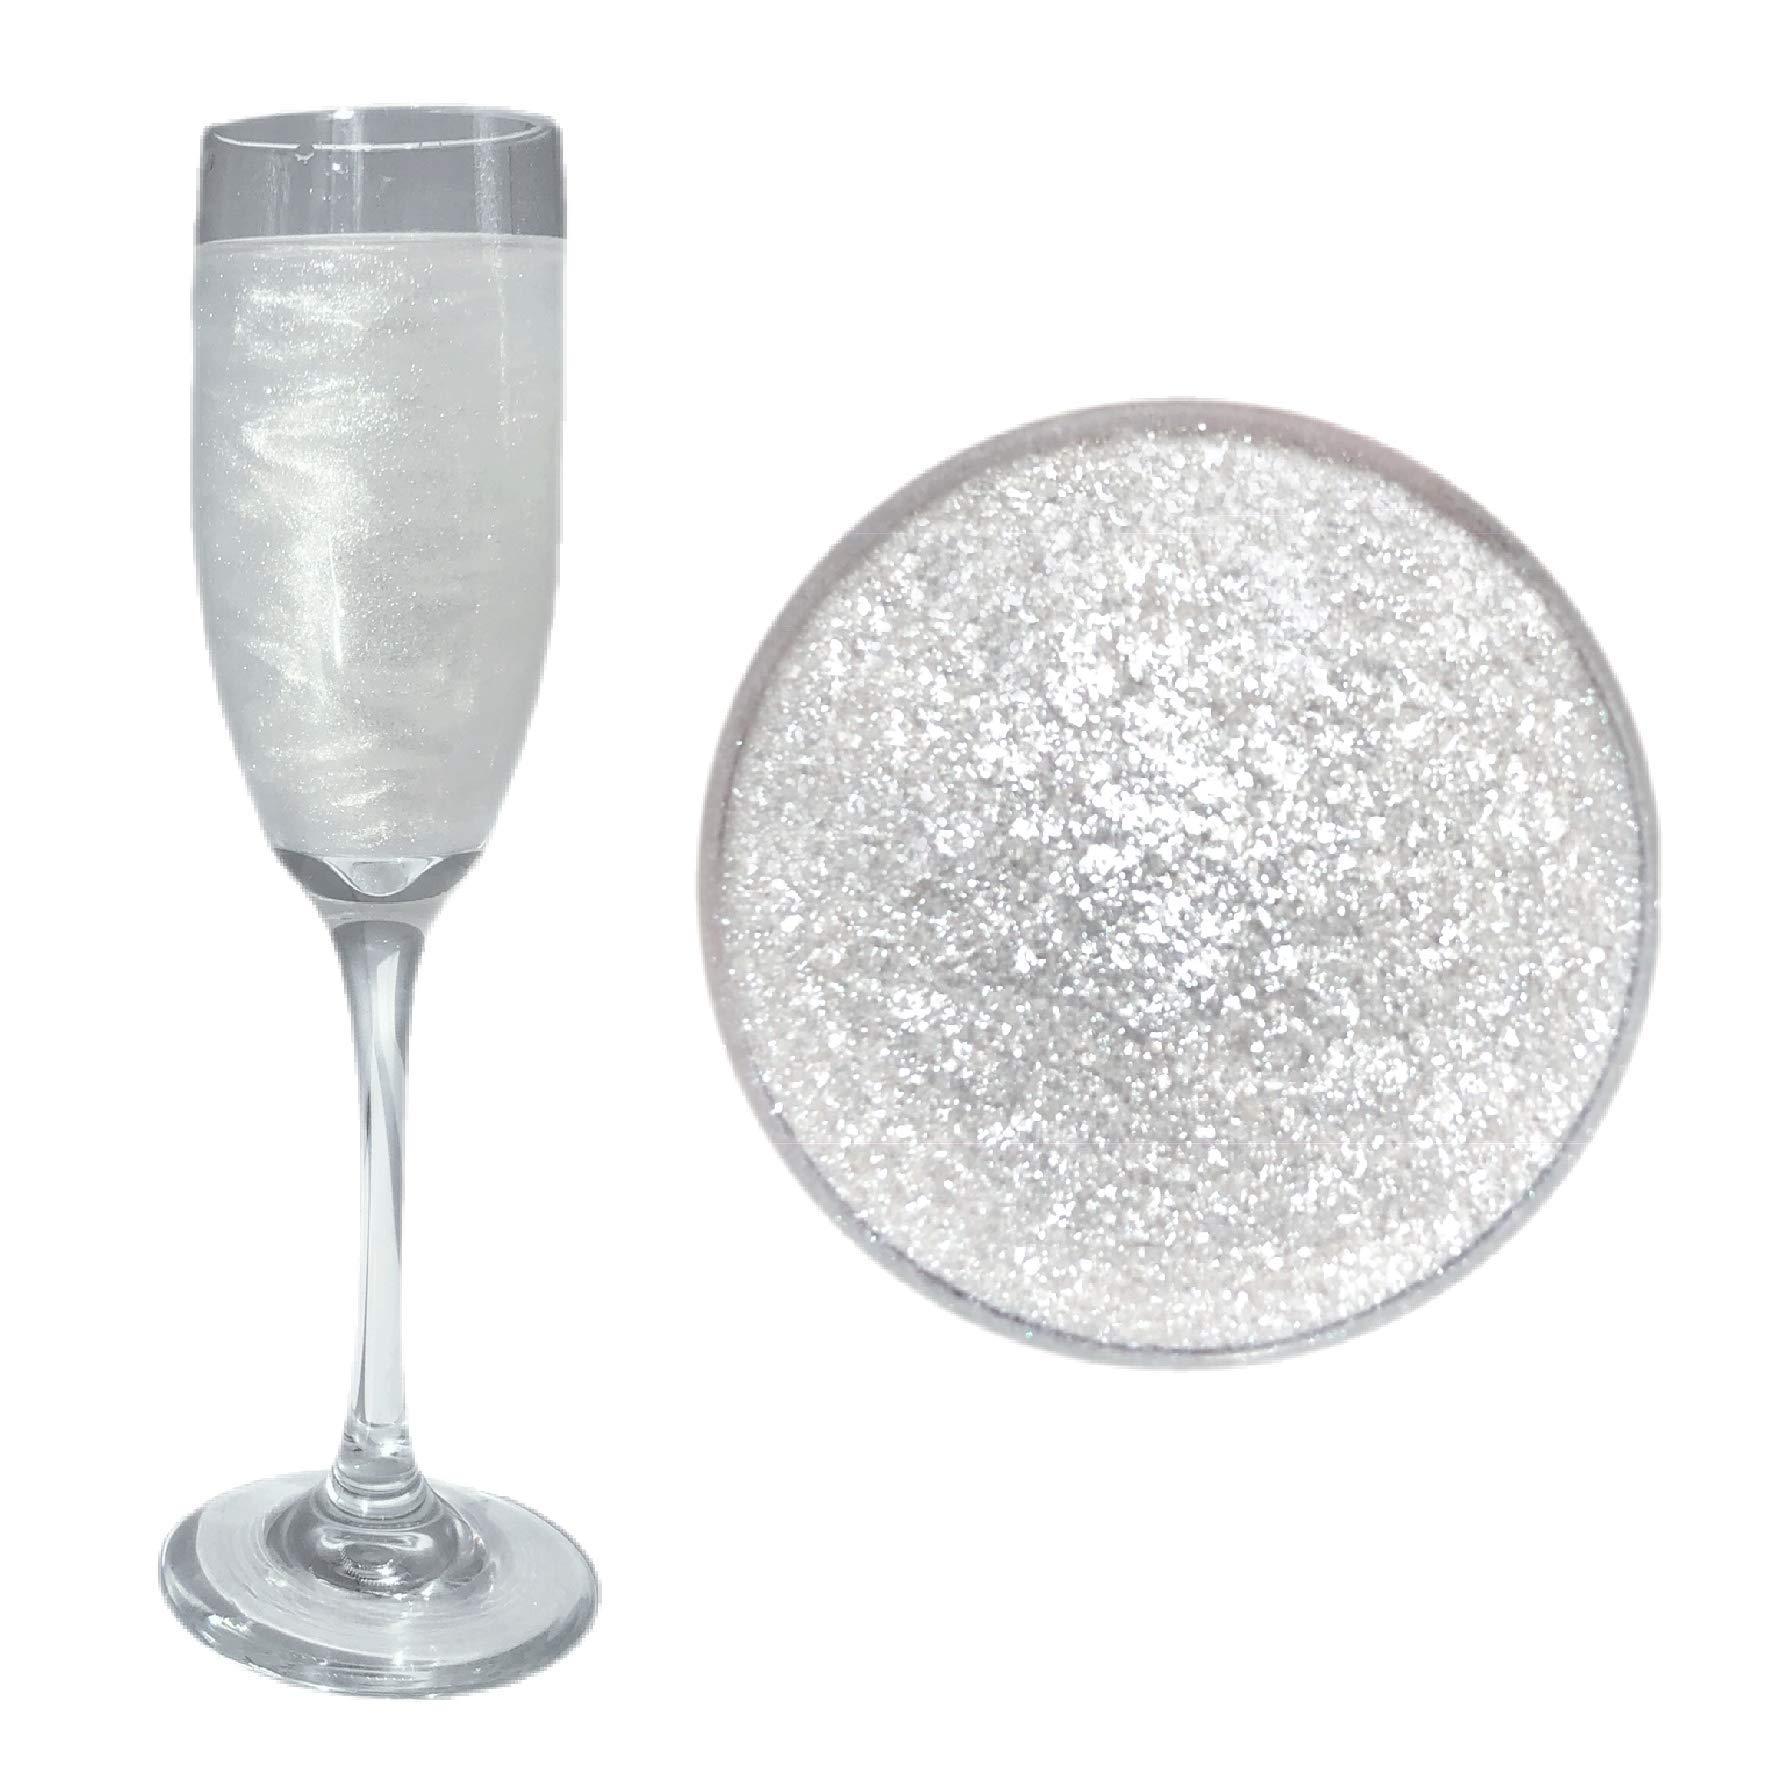 White Beer & Beverage Glitter   1 lb (450 grams)   Edible Food Grade Beer Glitter, Cocktail Glitter & Beverage Glitter-Dust from Bakell by Bakell (Image #1)